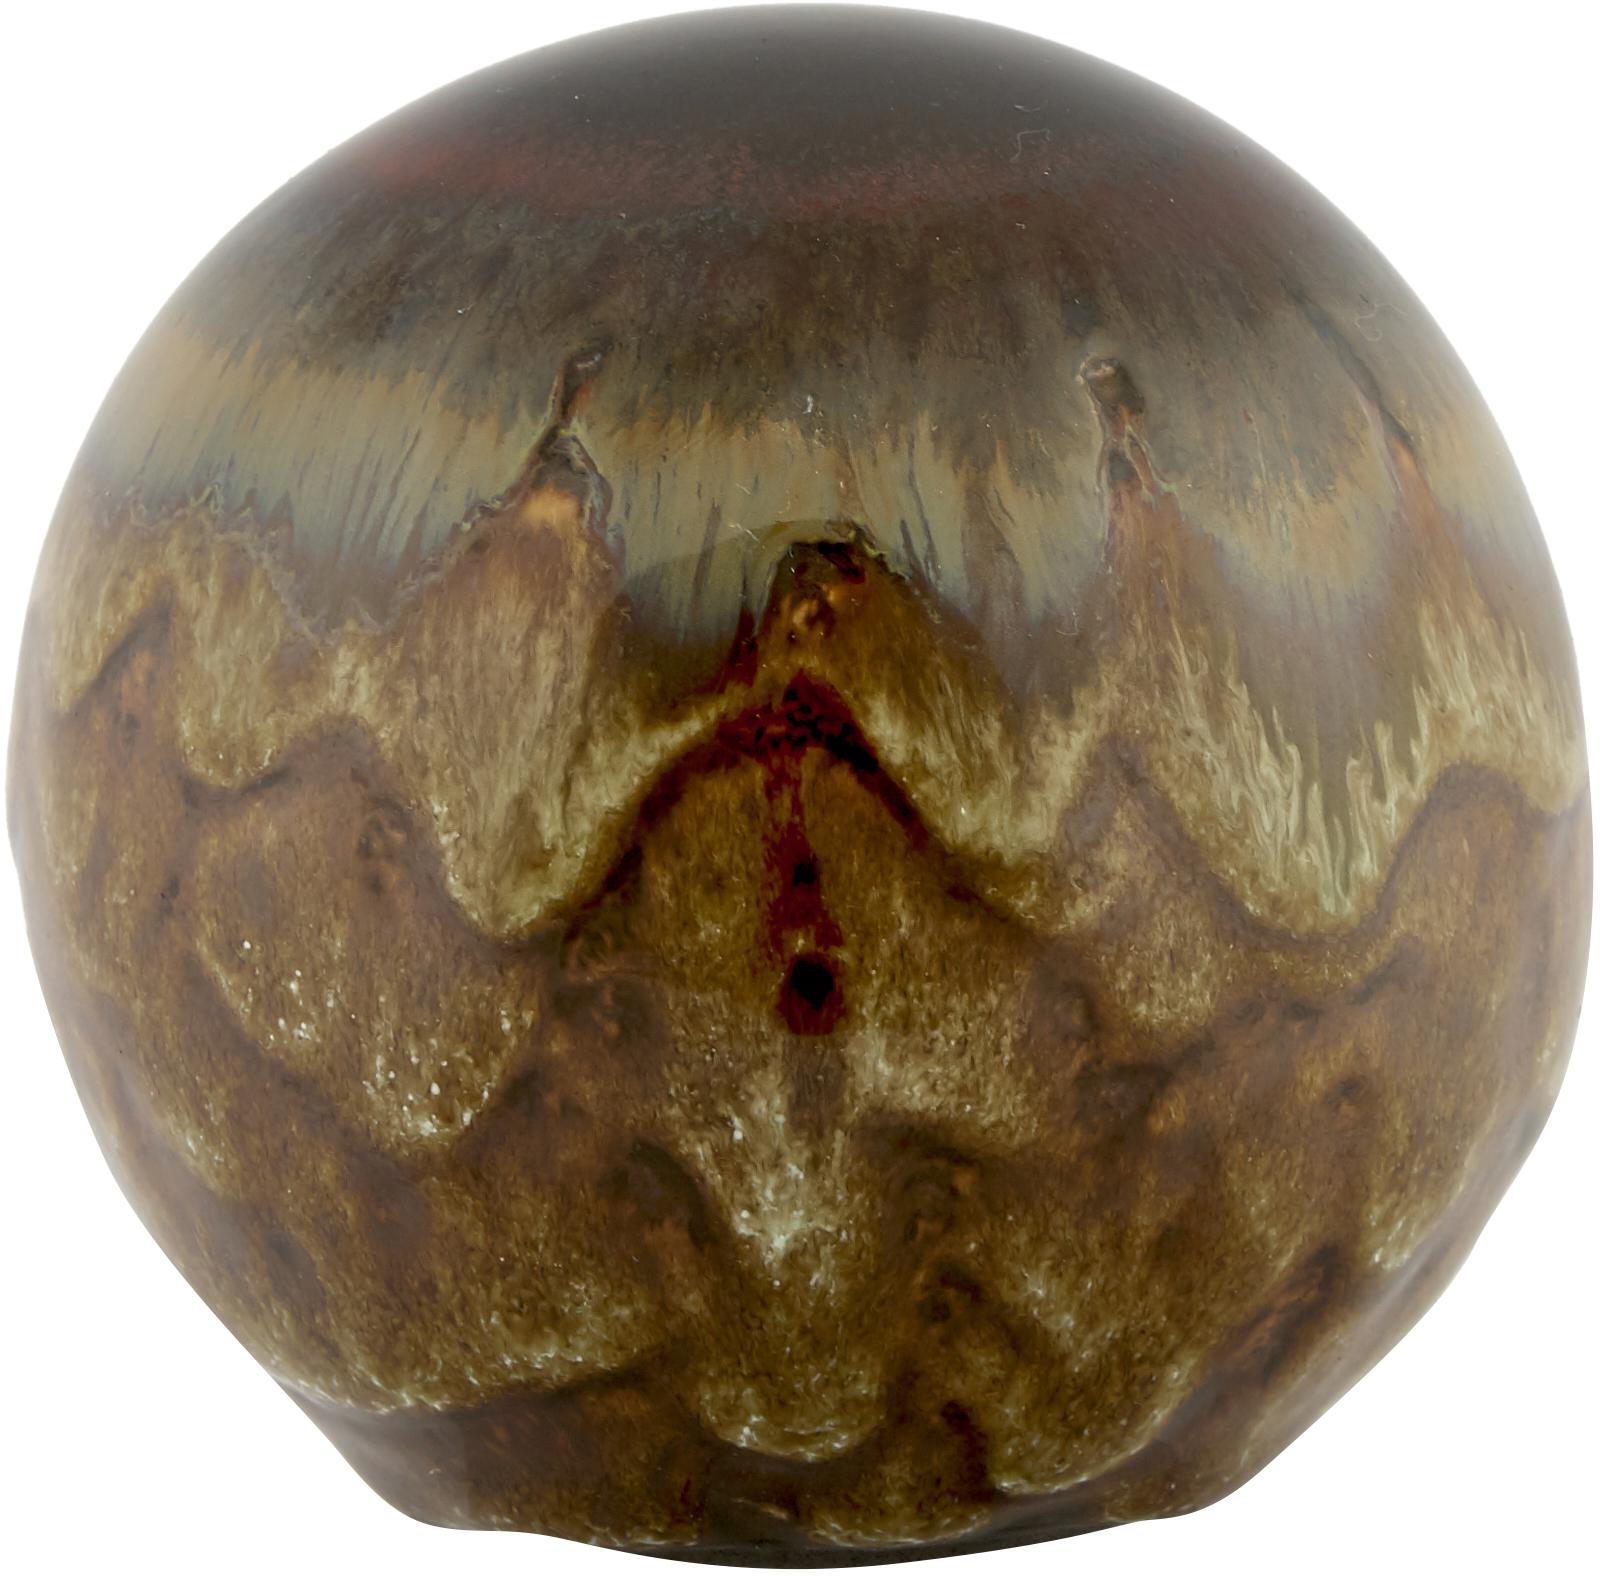 Handgefertigtes Deko-Kugel-Set Energy, 5-tlg., Steingut, Mehfarbig, Ø 8 cm